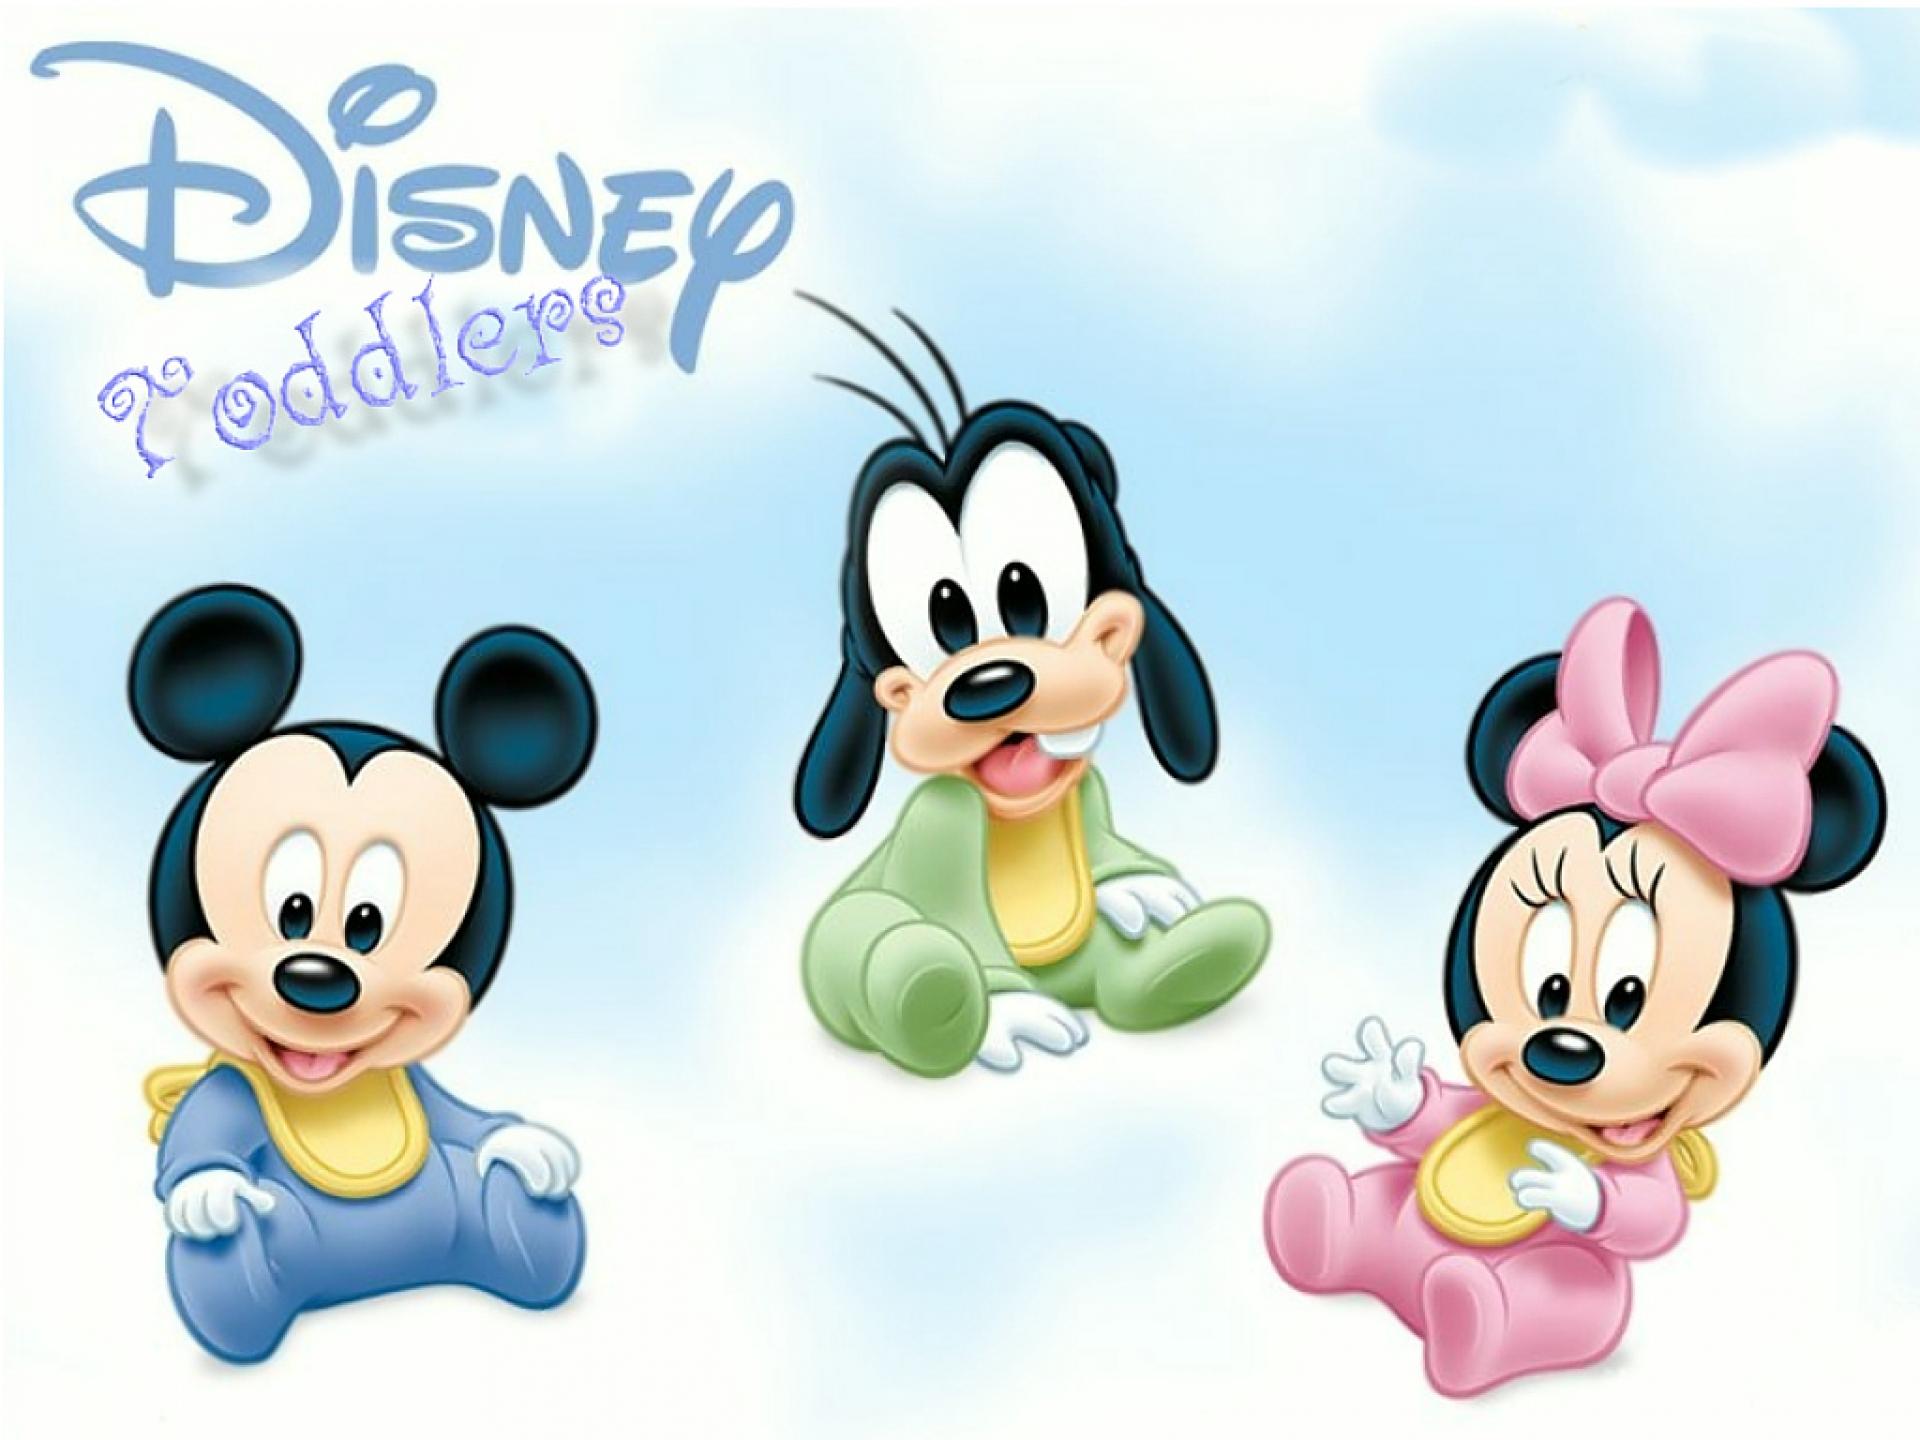 Cartoon Characters Walt Disney Wallpaper Deskt 10716 Wallpaper 1920x1440